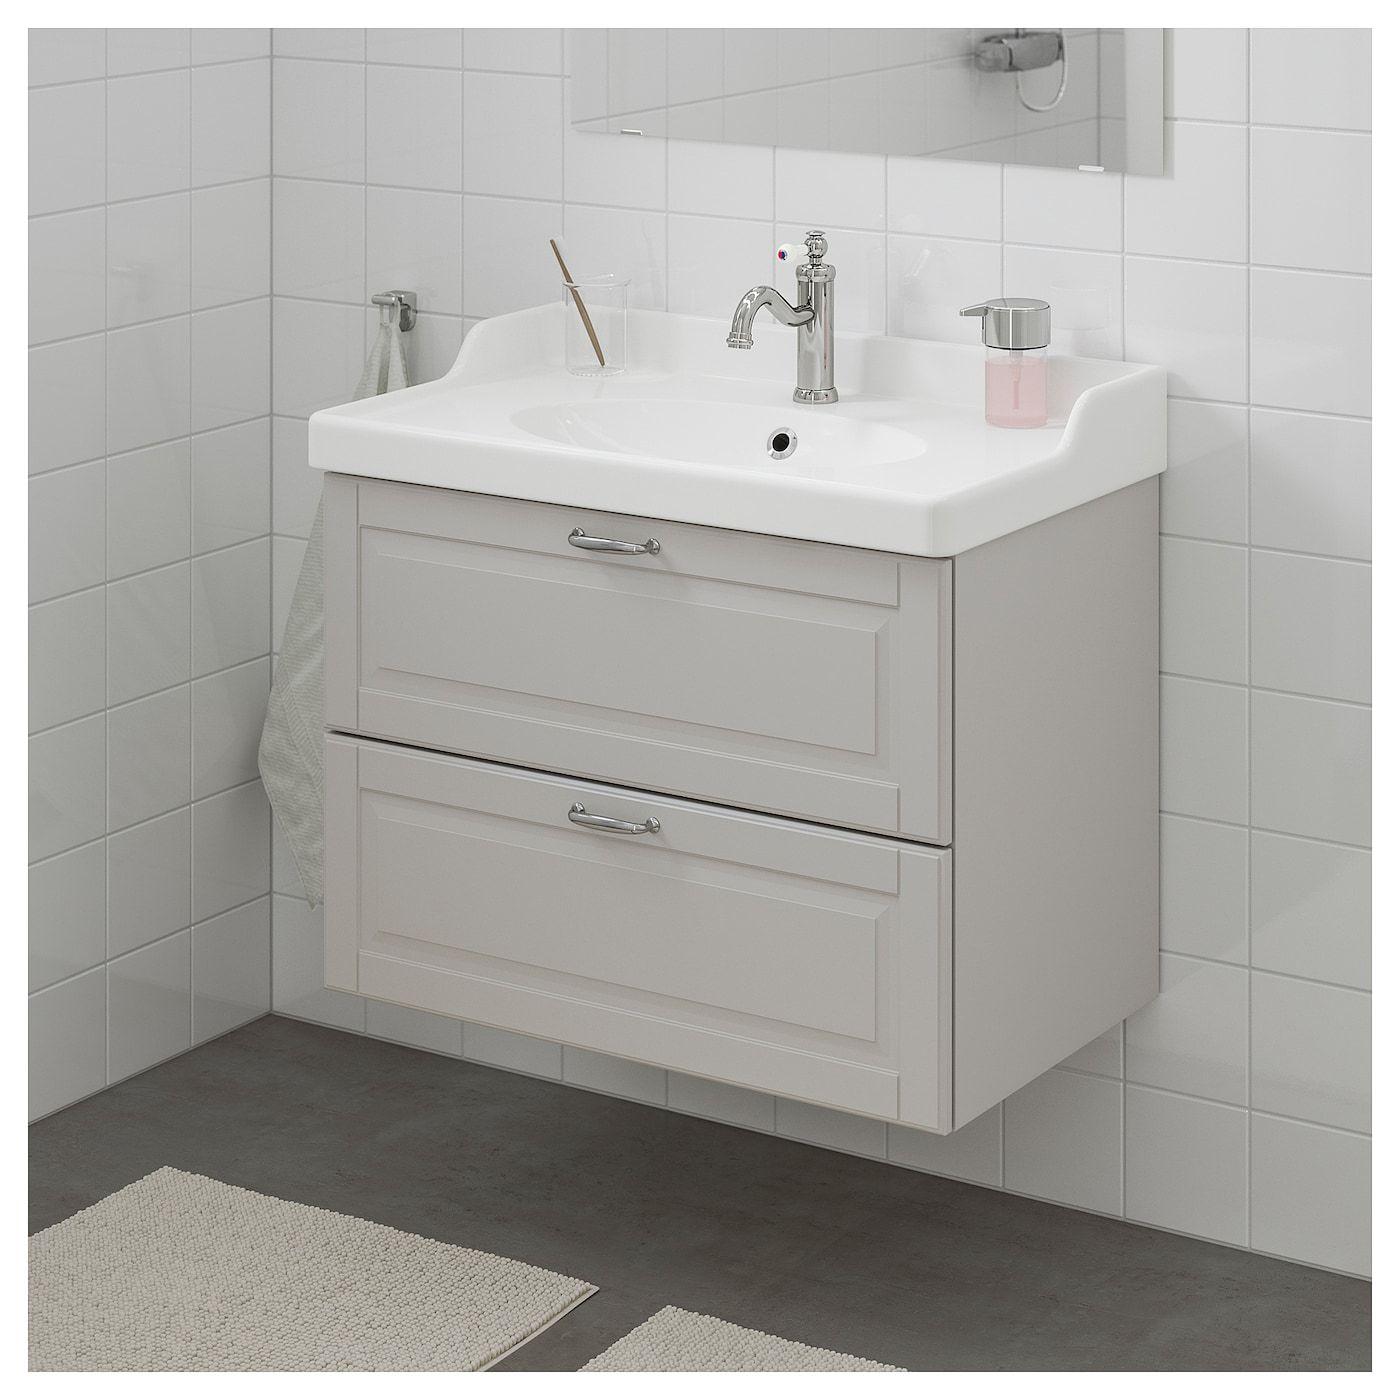 Ikea Godmorgon Rattviken Bathroom Vanity Kasjon Light Gray Ikea Godmorgon Bathroom Vanity Ikea